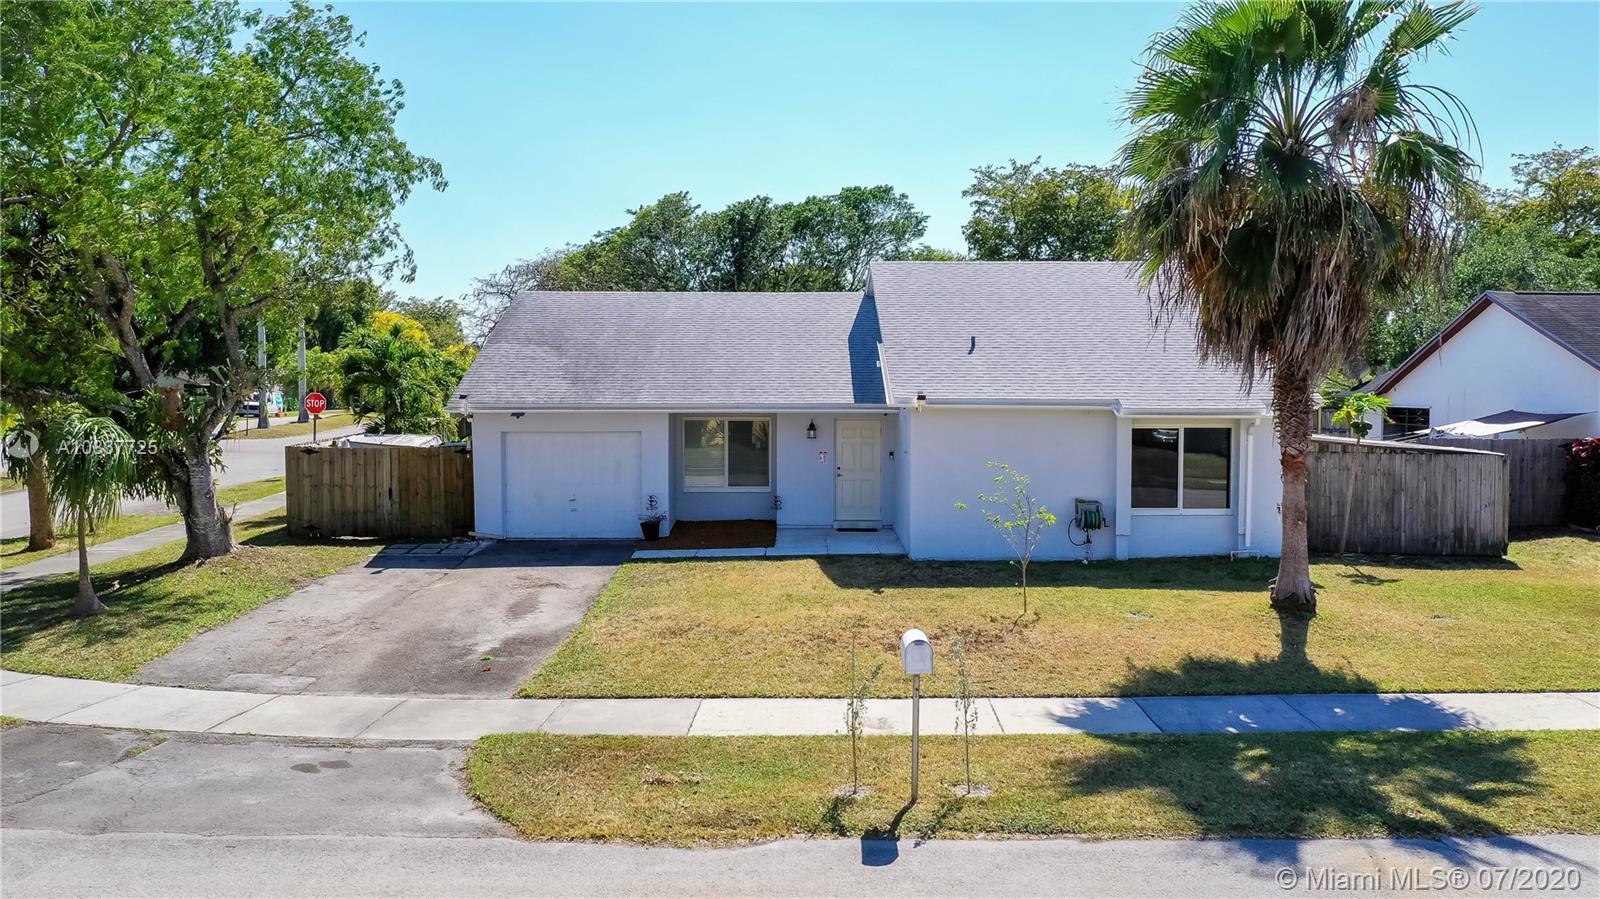 986 S Bluebird Ln, Homestead, FL 33035 - Homestead, FL real estate listing